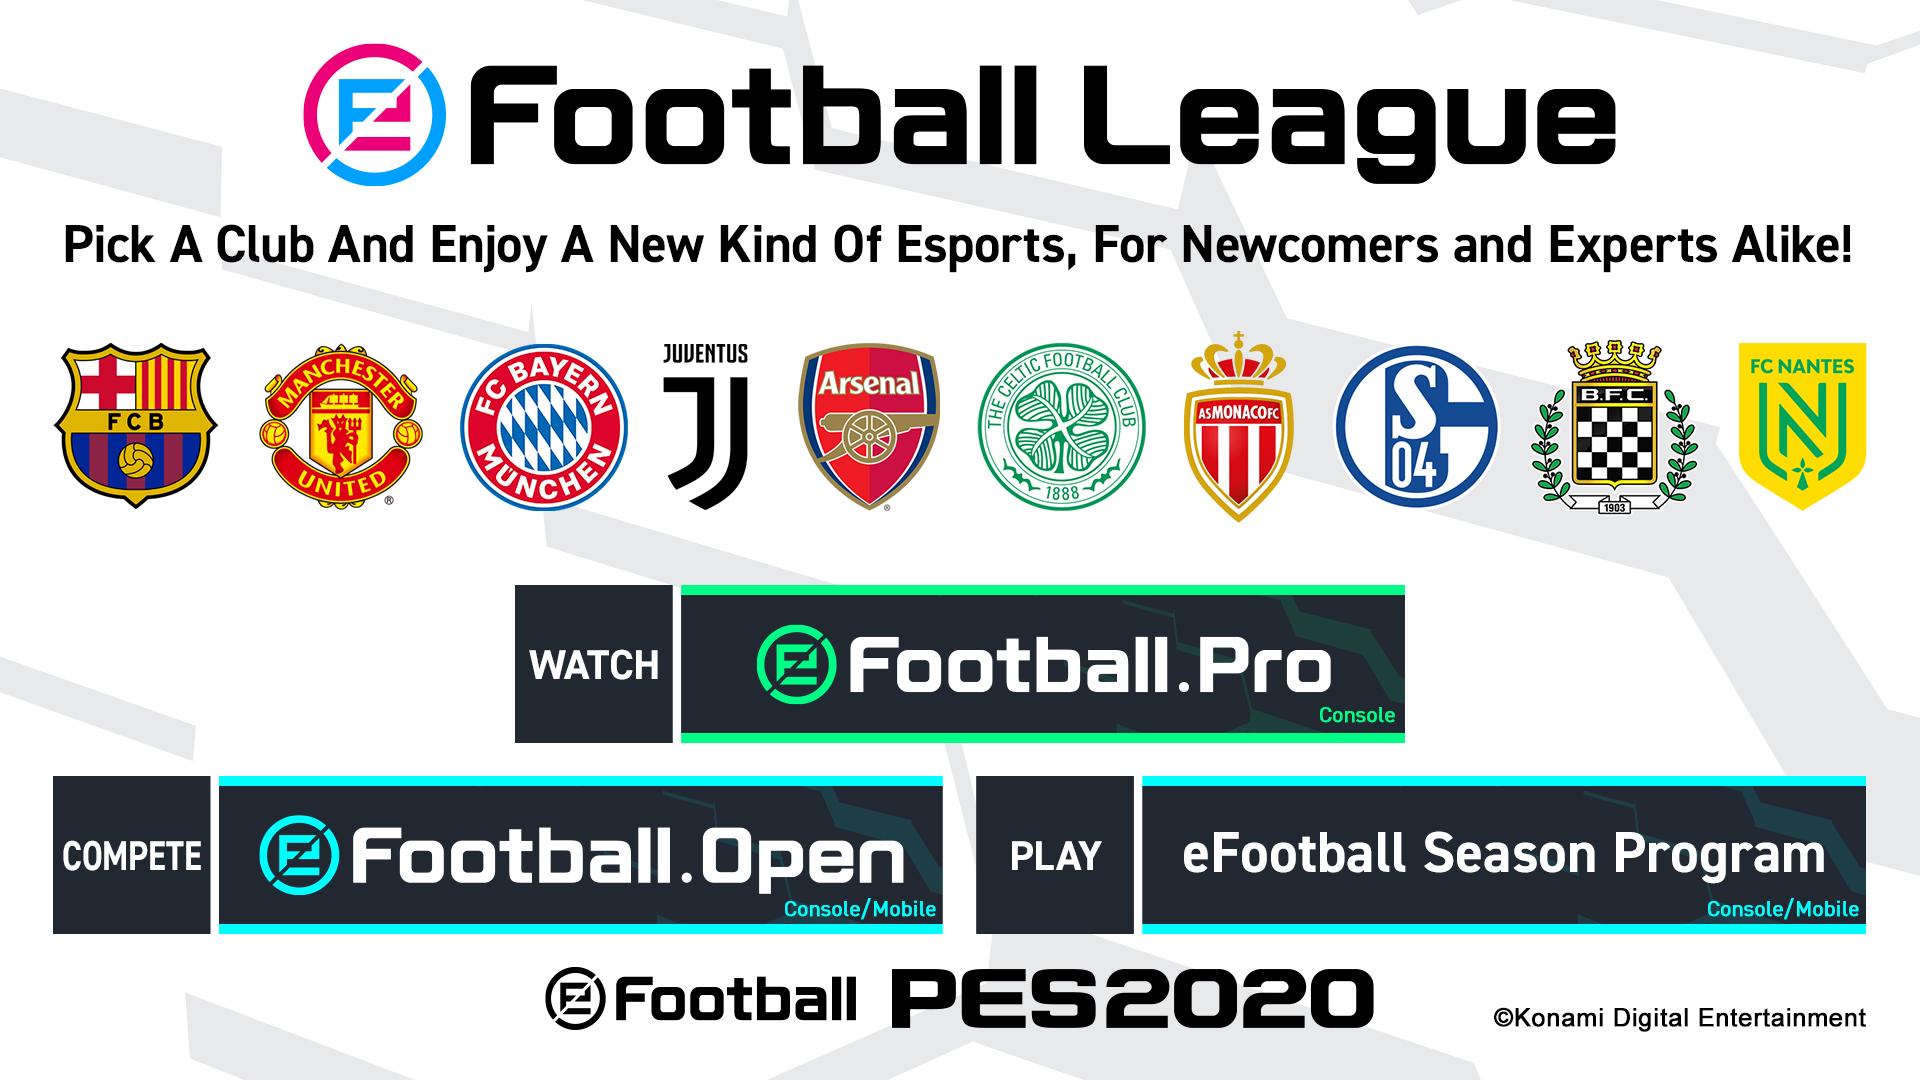 eFootball league 01 PES